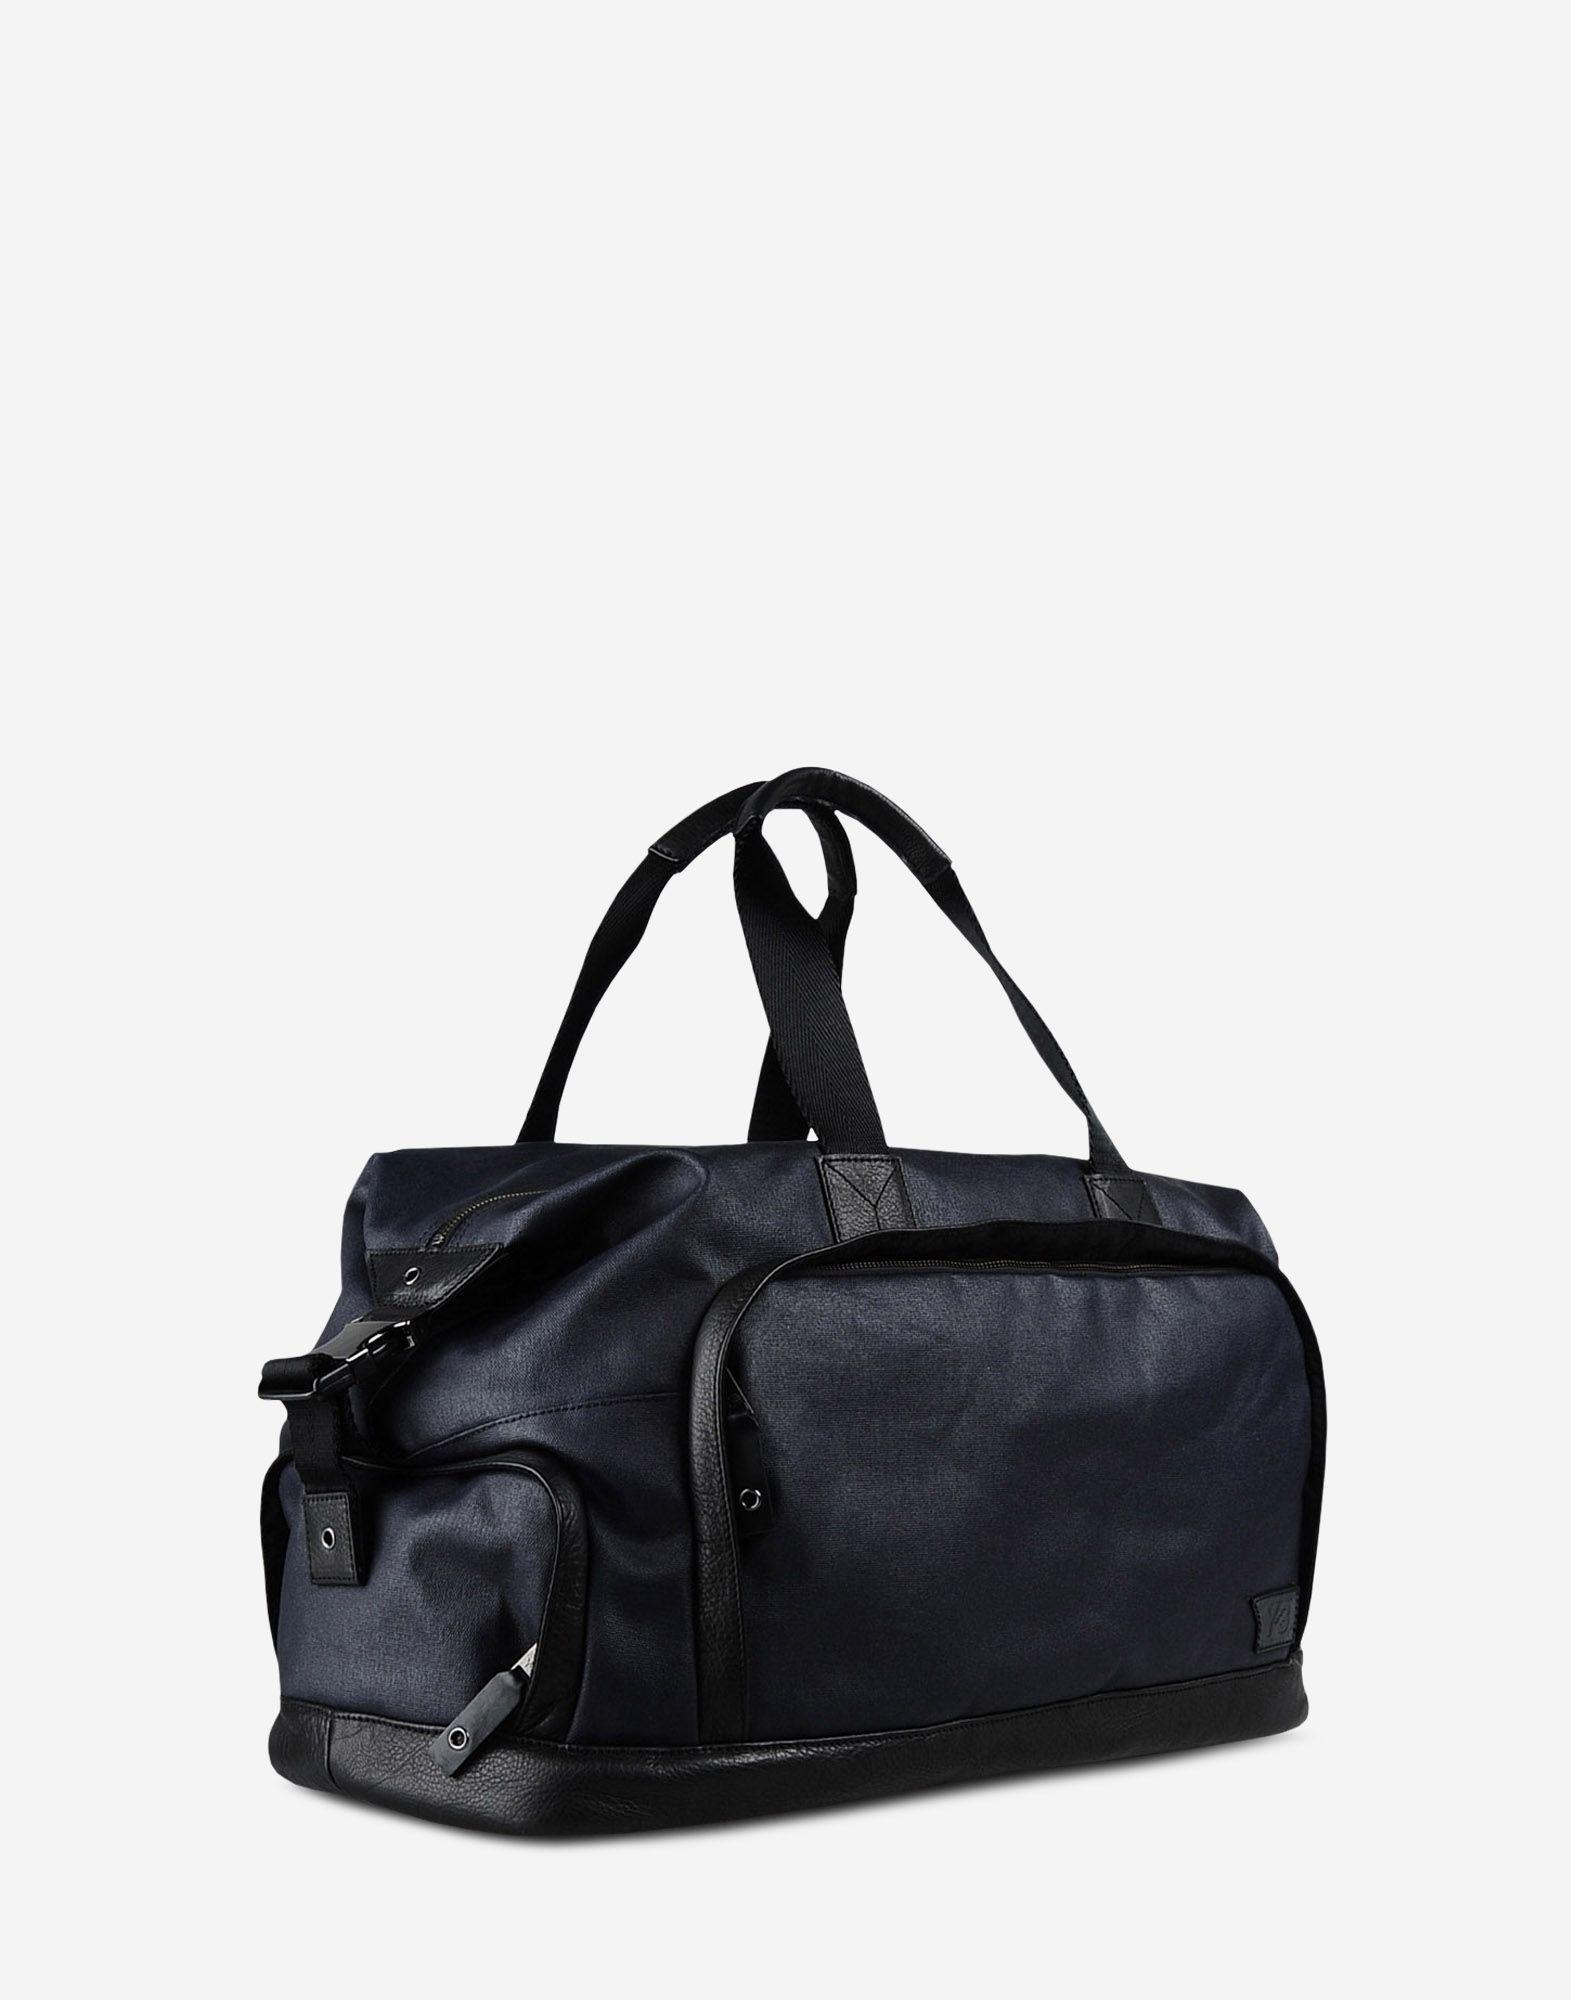 1335ccb764 ... Y-3 Y-3 Toile Weekender Bag Gym bag E r ...